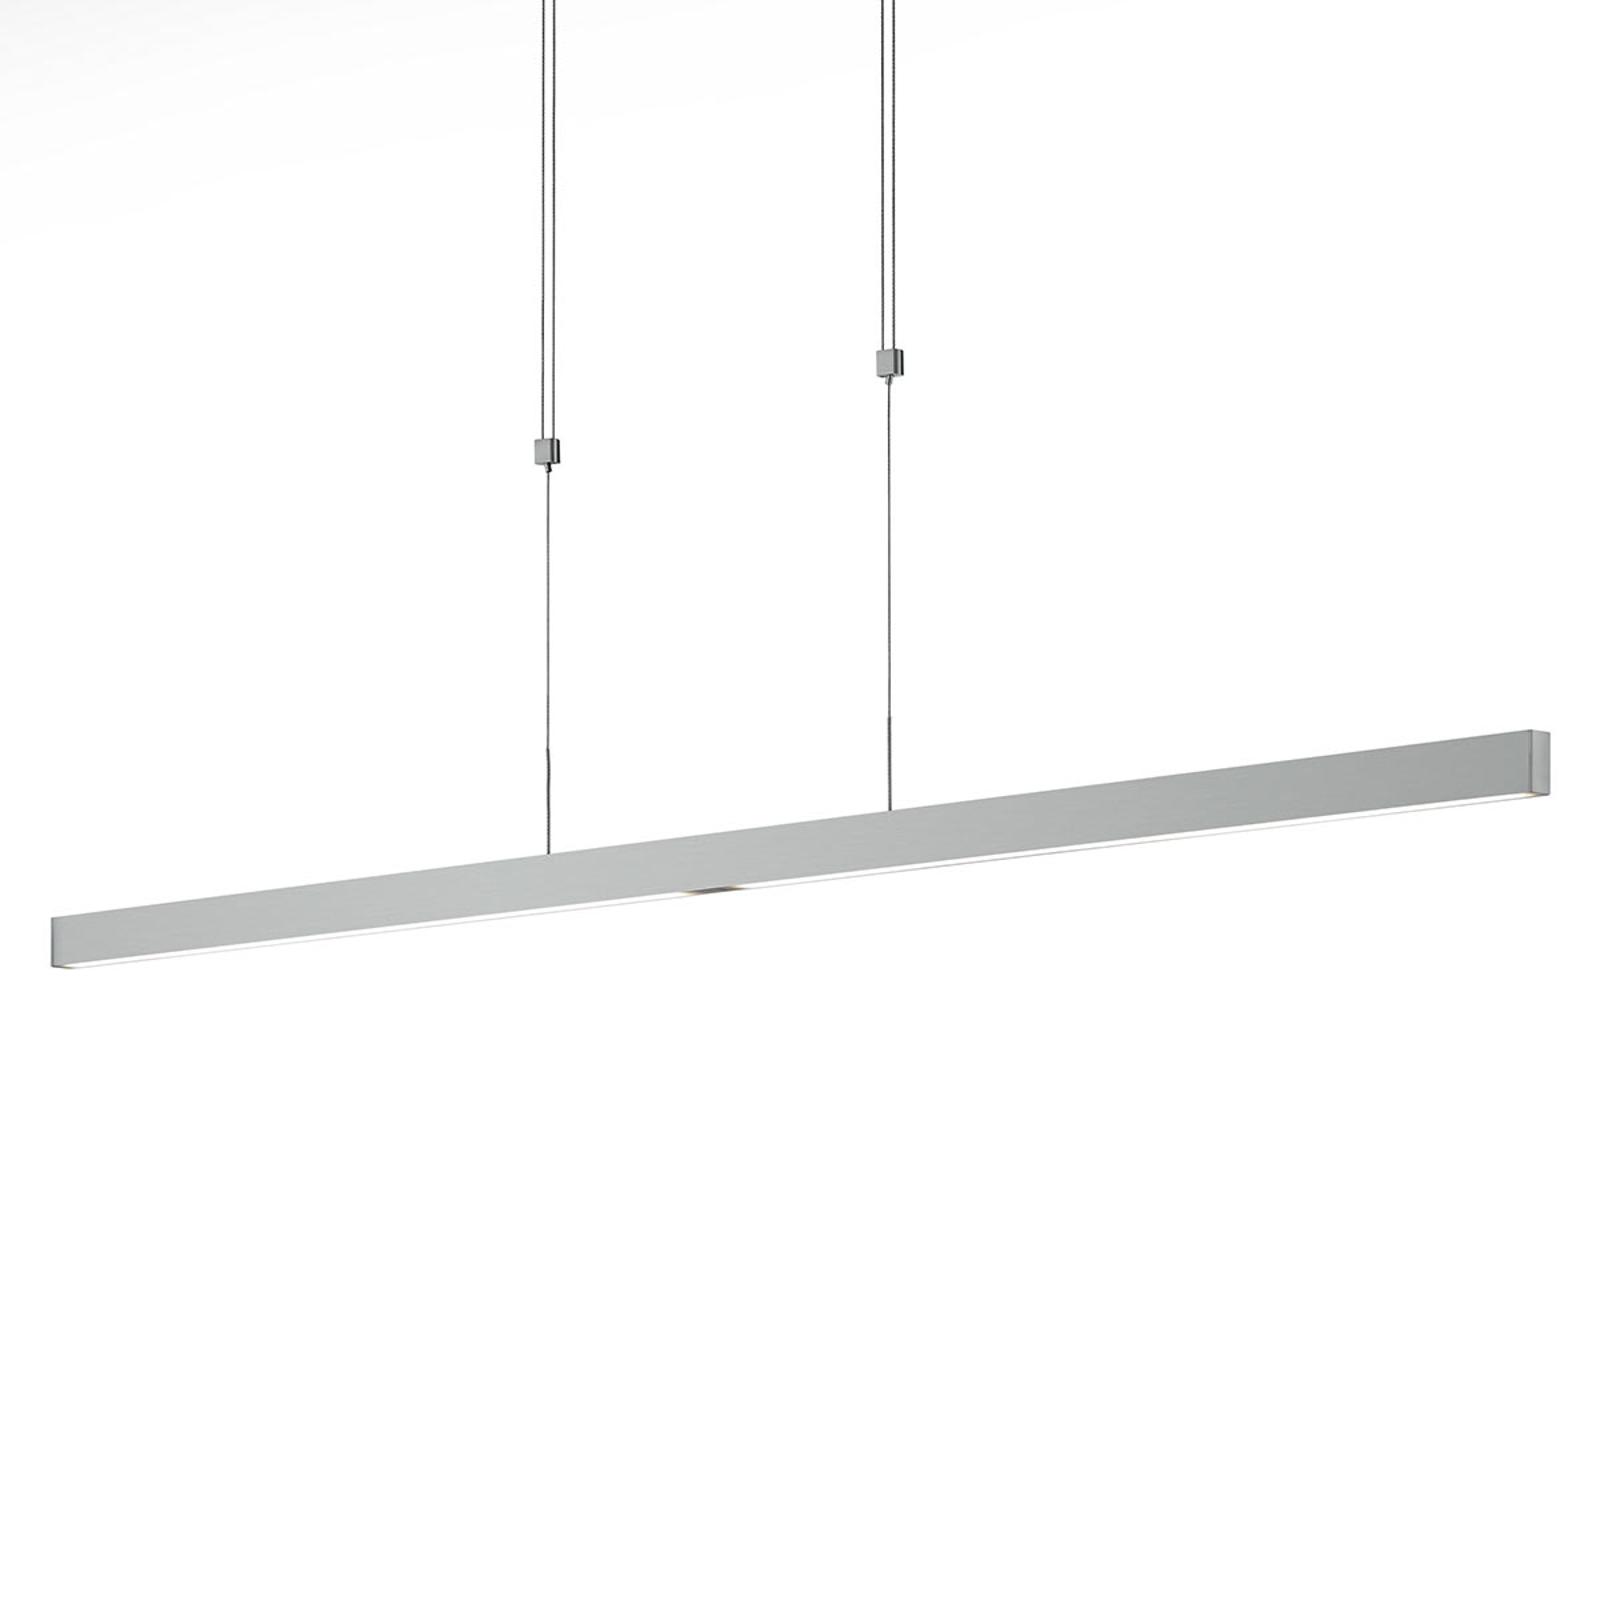 LED-Hängelampe Pia Gestensensor nickel matt 128 cm